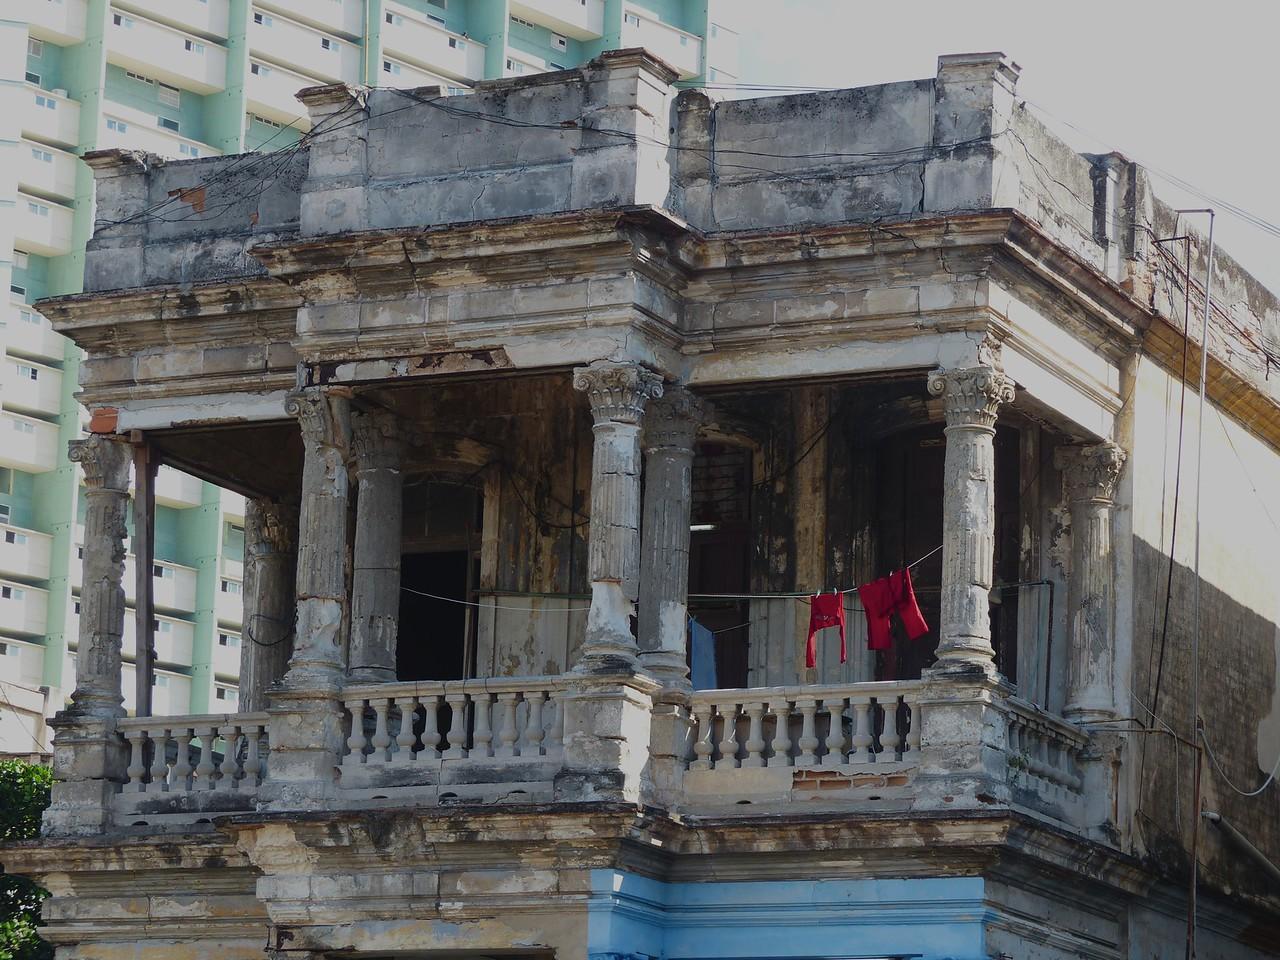 Havana -  Looks like someone is living here.